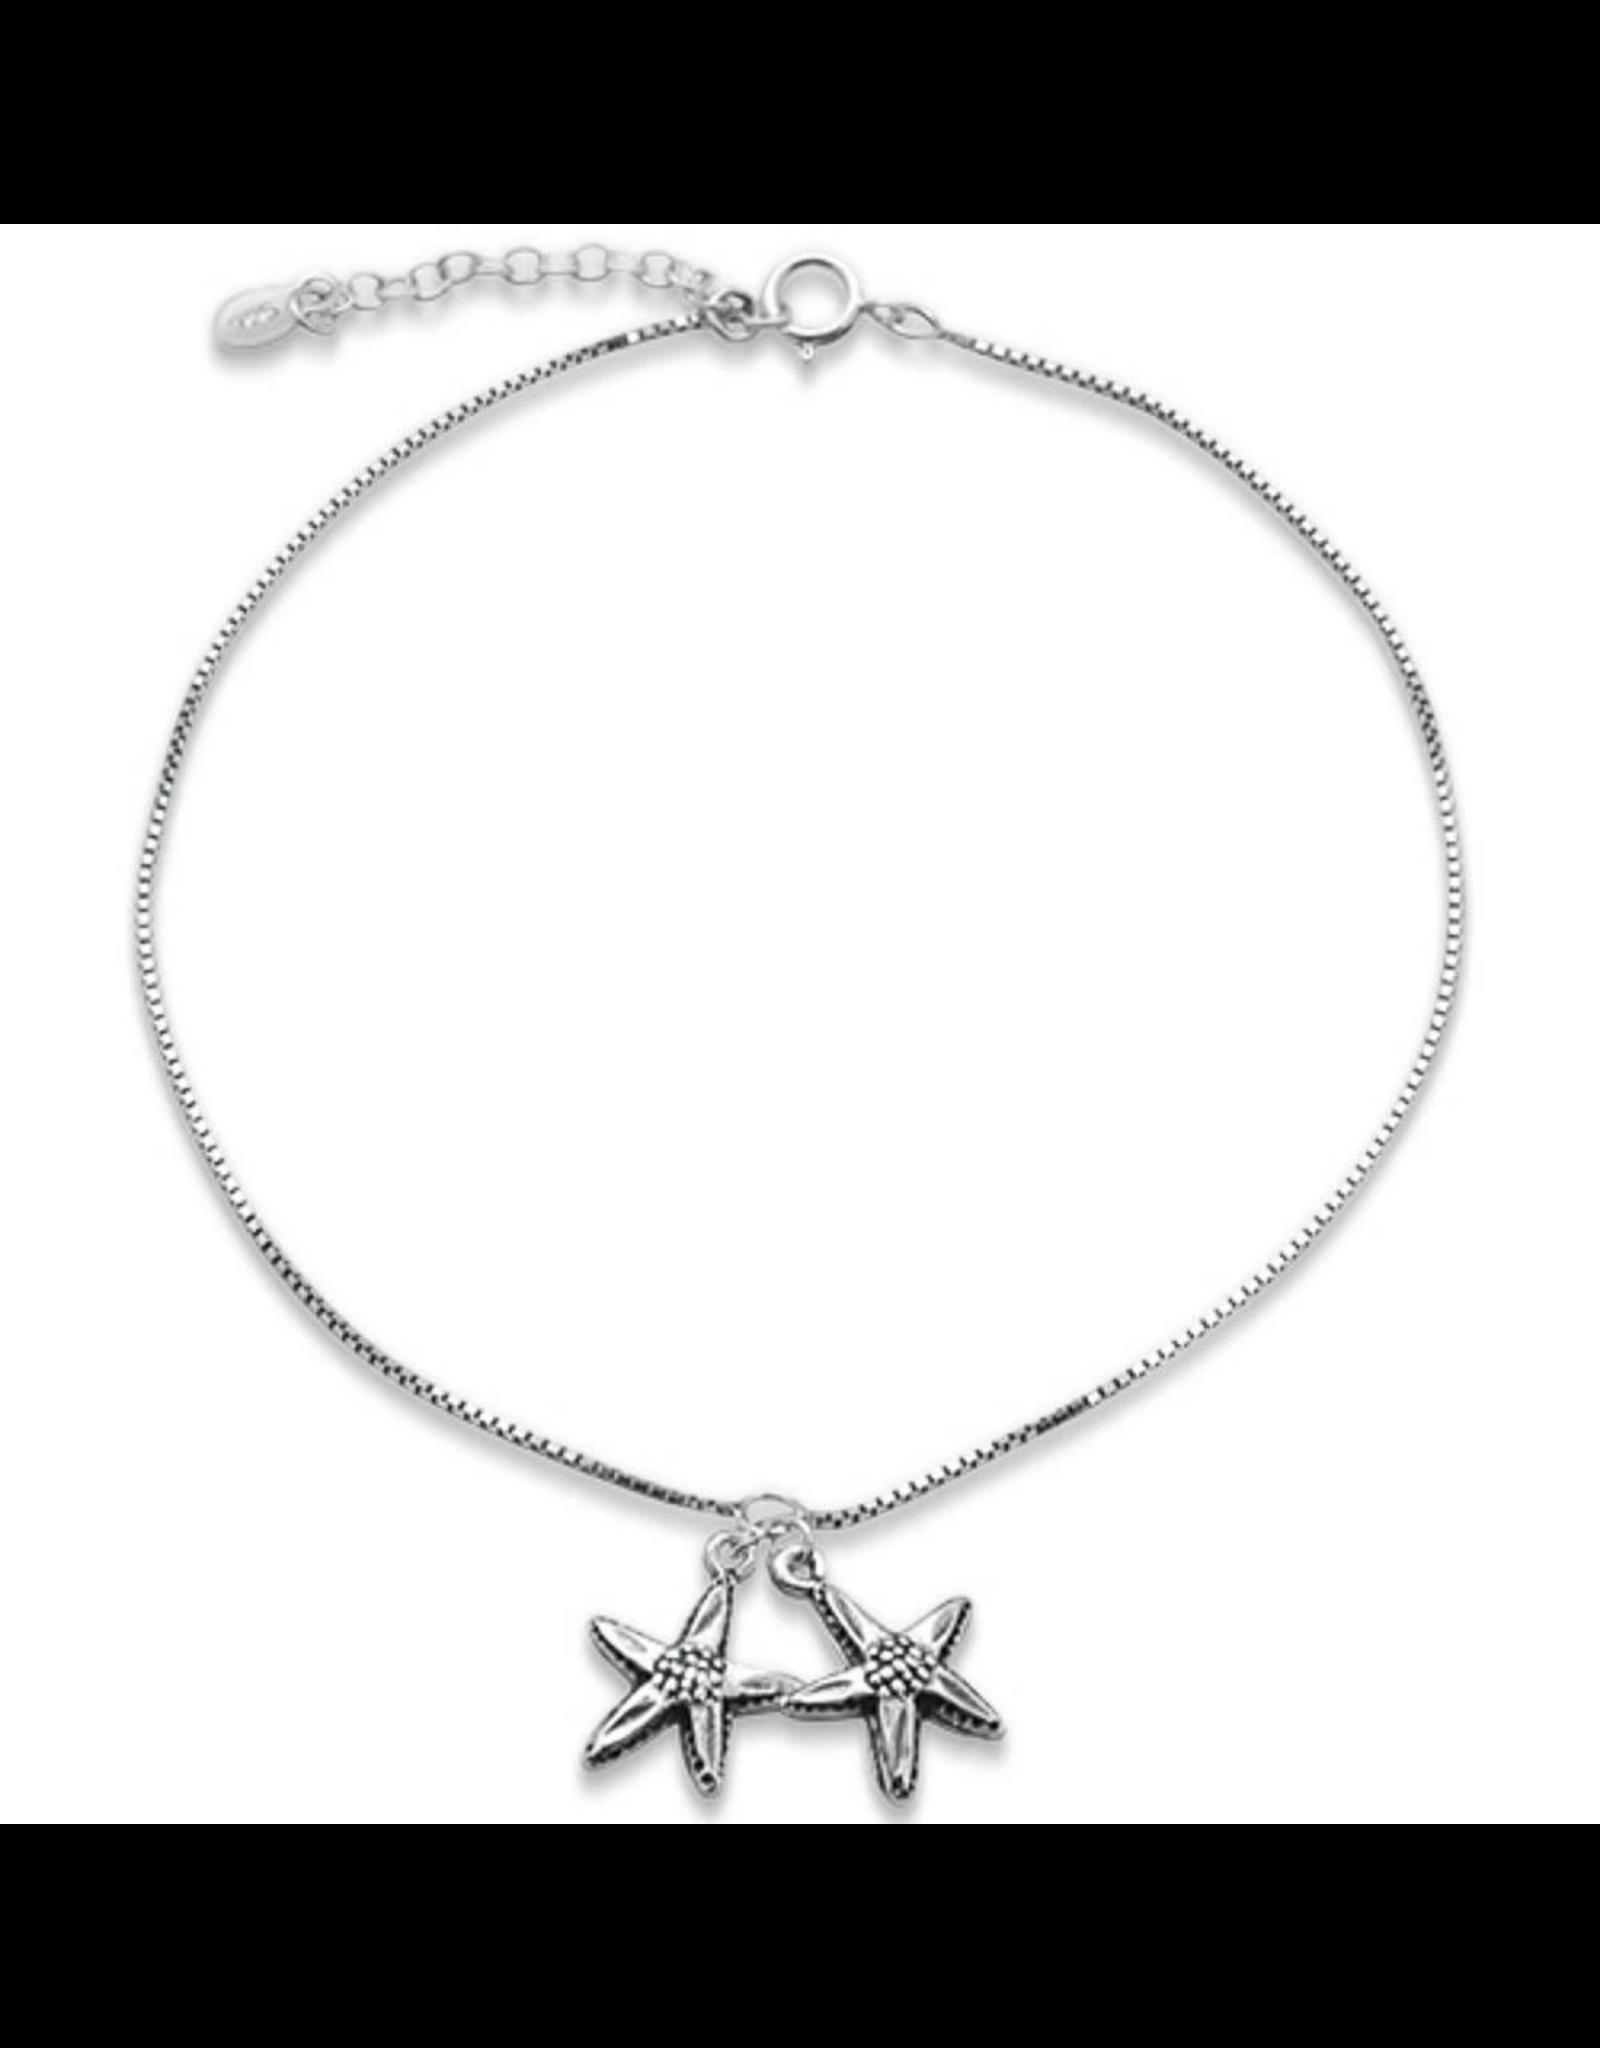 Sonara Jewelry Double Starfish Anklet